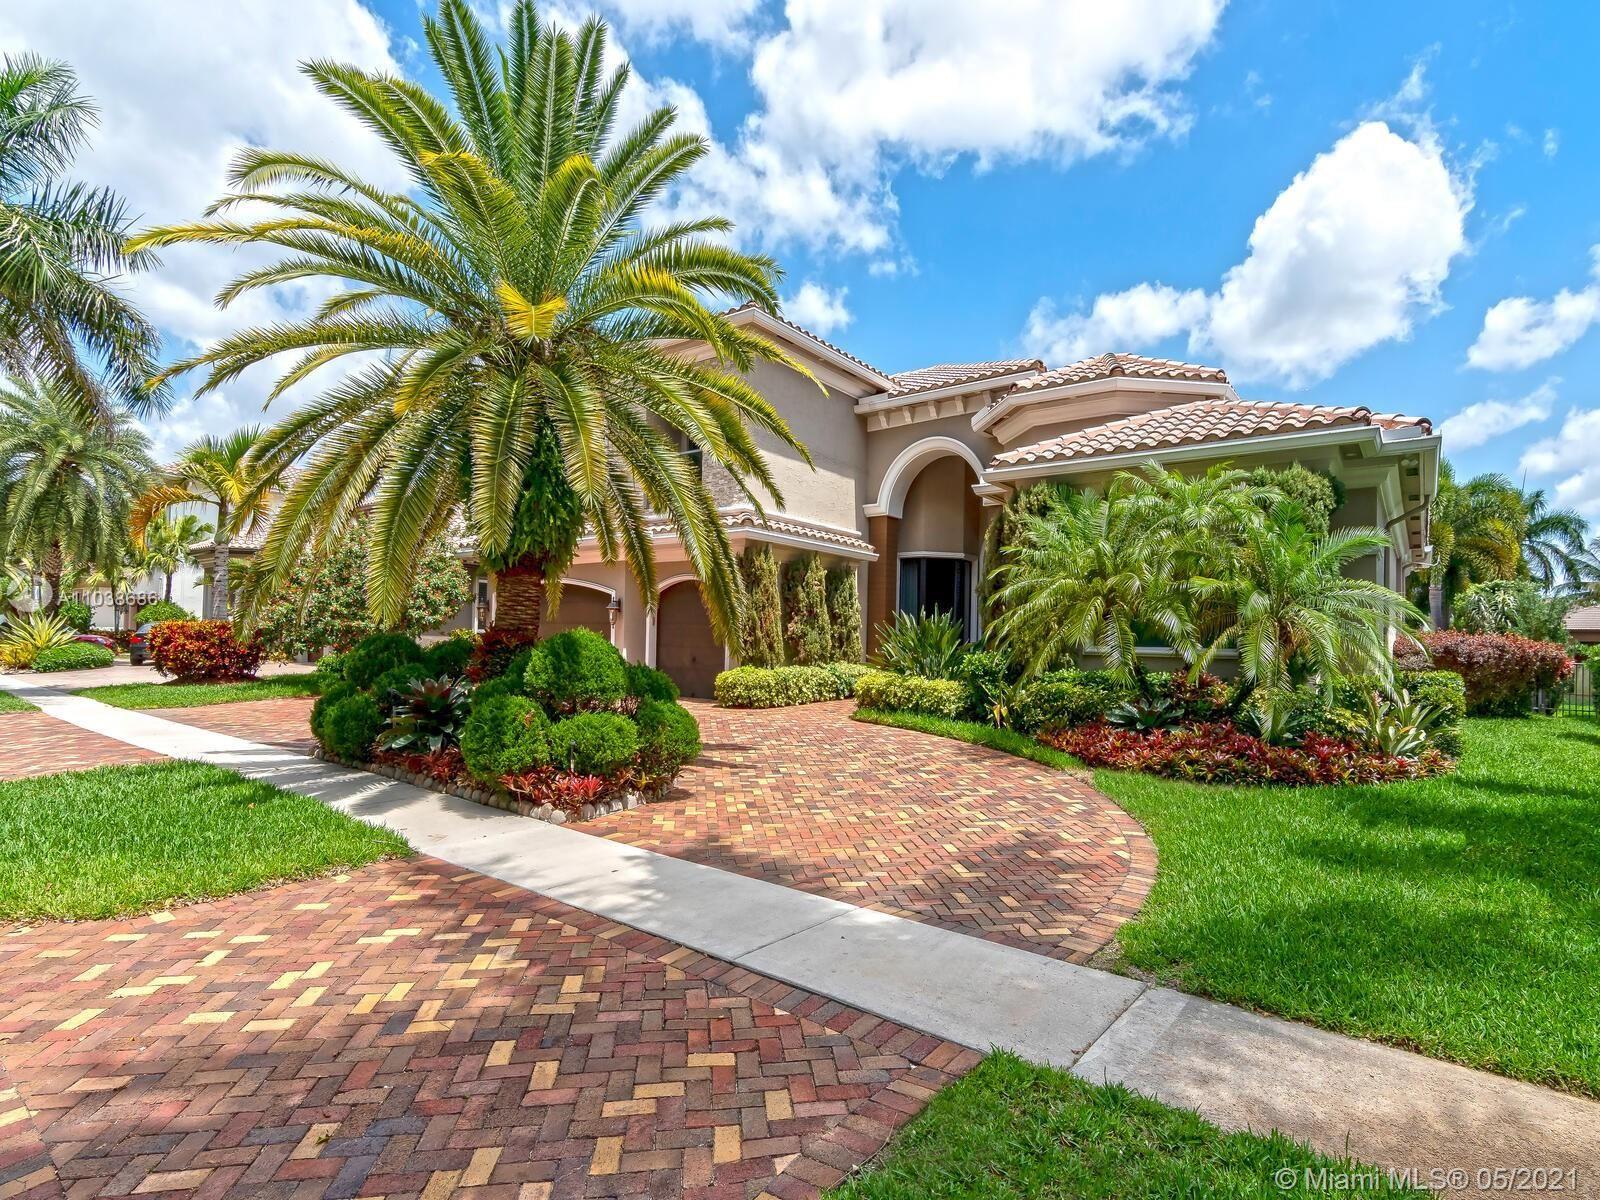 10231 Blue Palm St, Plantation, FL 33324 - #: A11038686